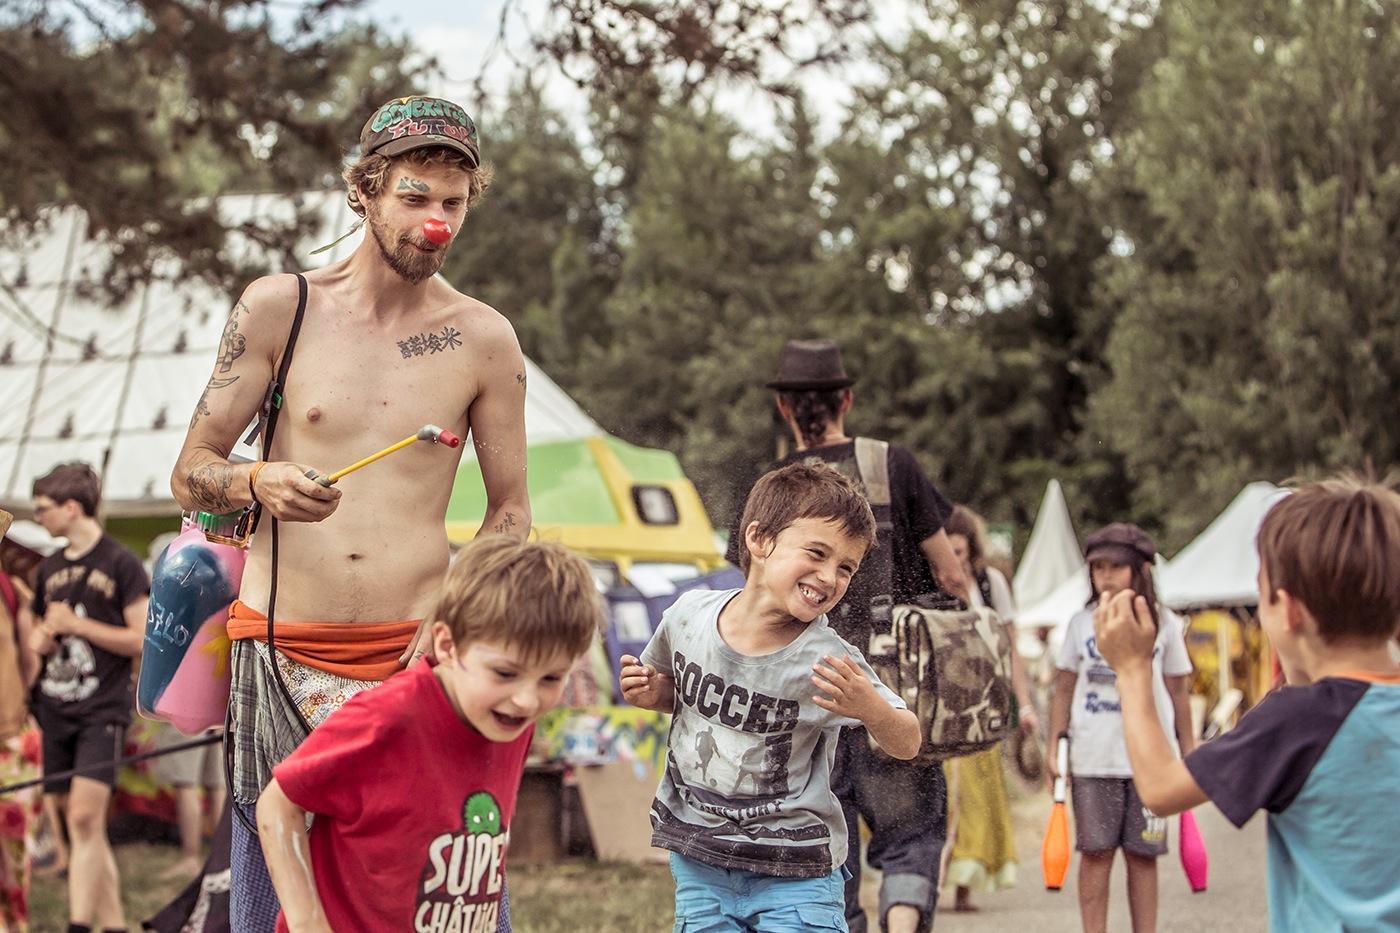 21-photographe-reportage-reve-de-laborigene-2016-guillaume-heraud-enfants-arroses-small